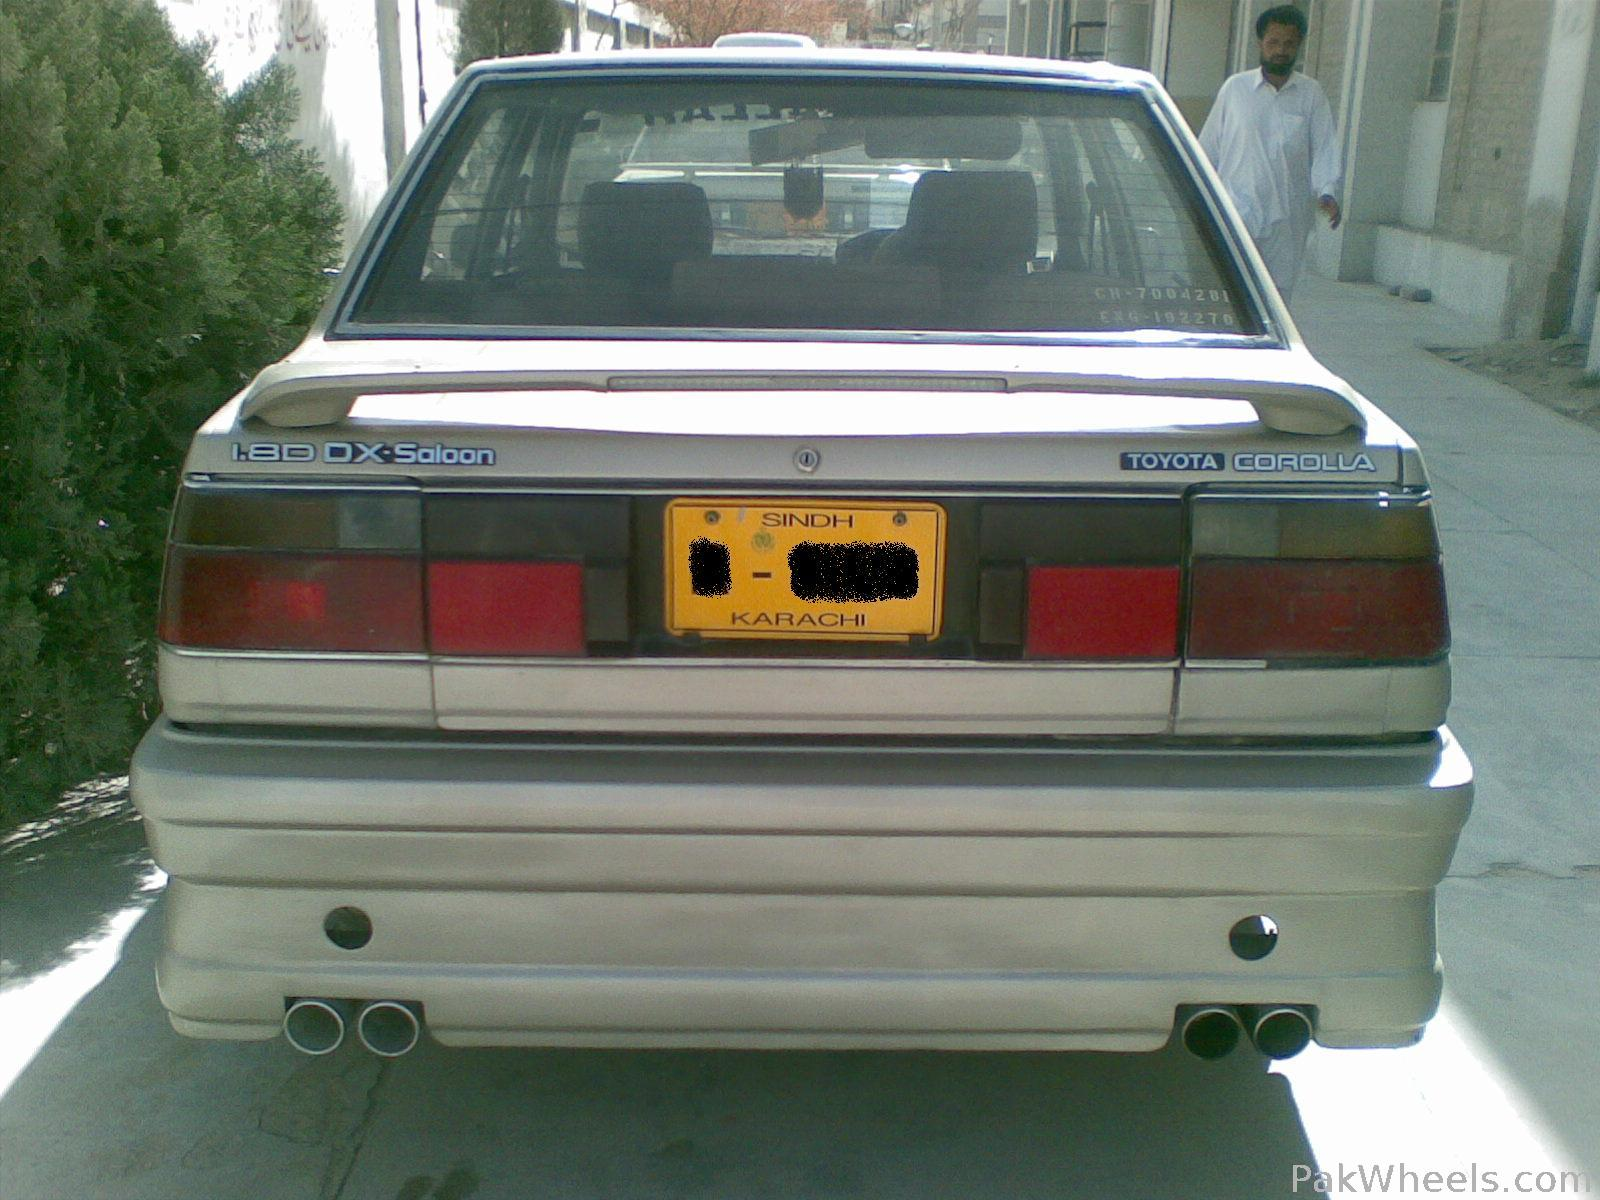 2010 Toyota Corolla For Sale >> Toyota Corolla 1986 of khurram143us - Member Ride 10167 ...